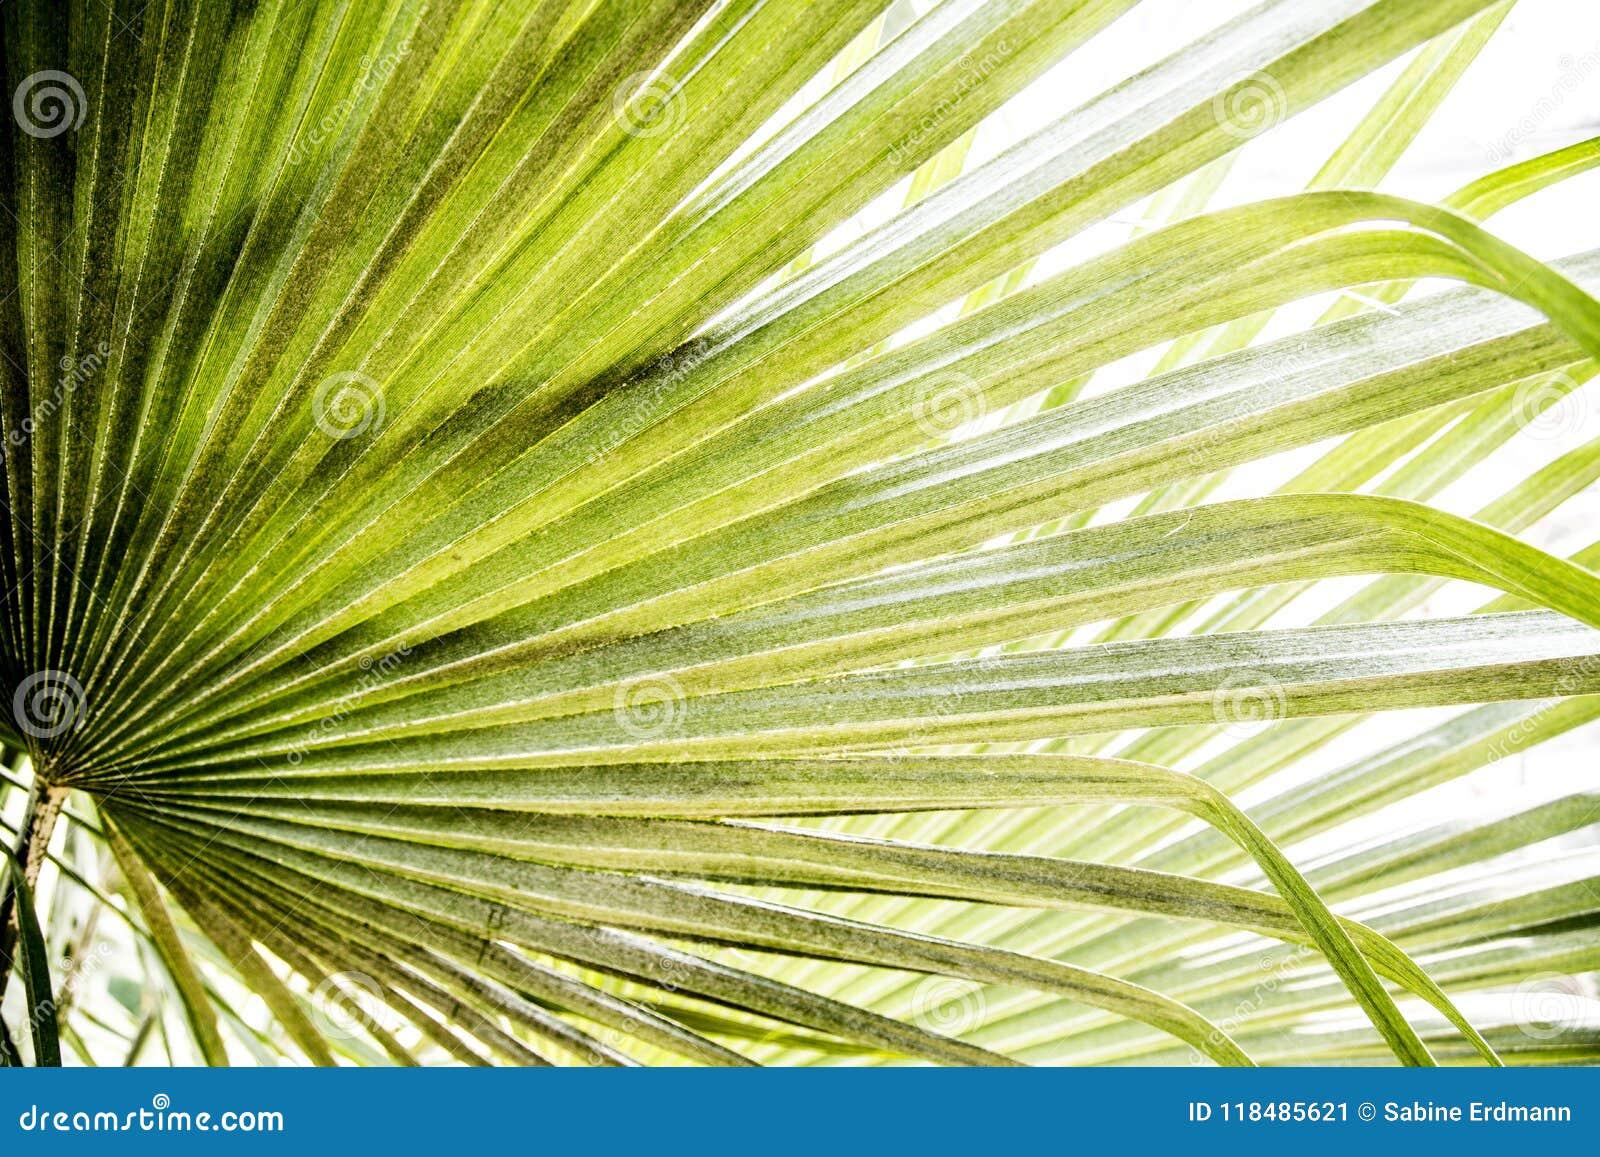 Helder palmblad